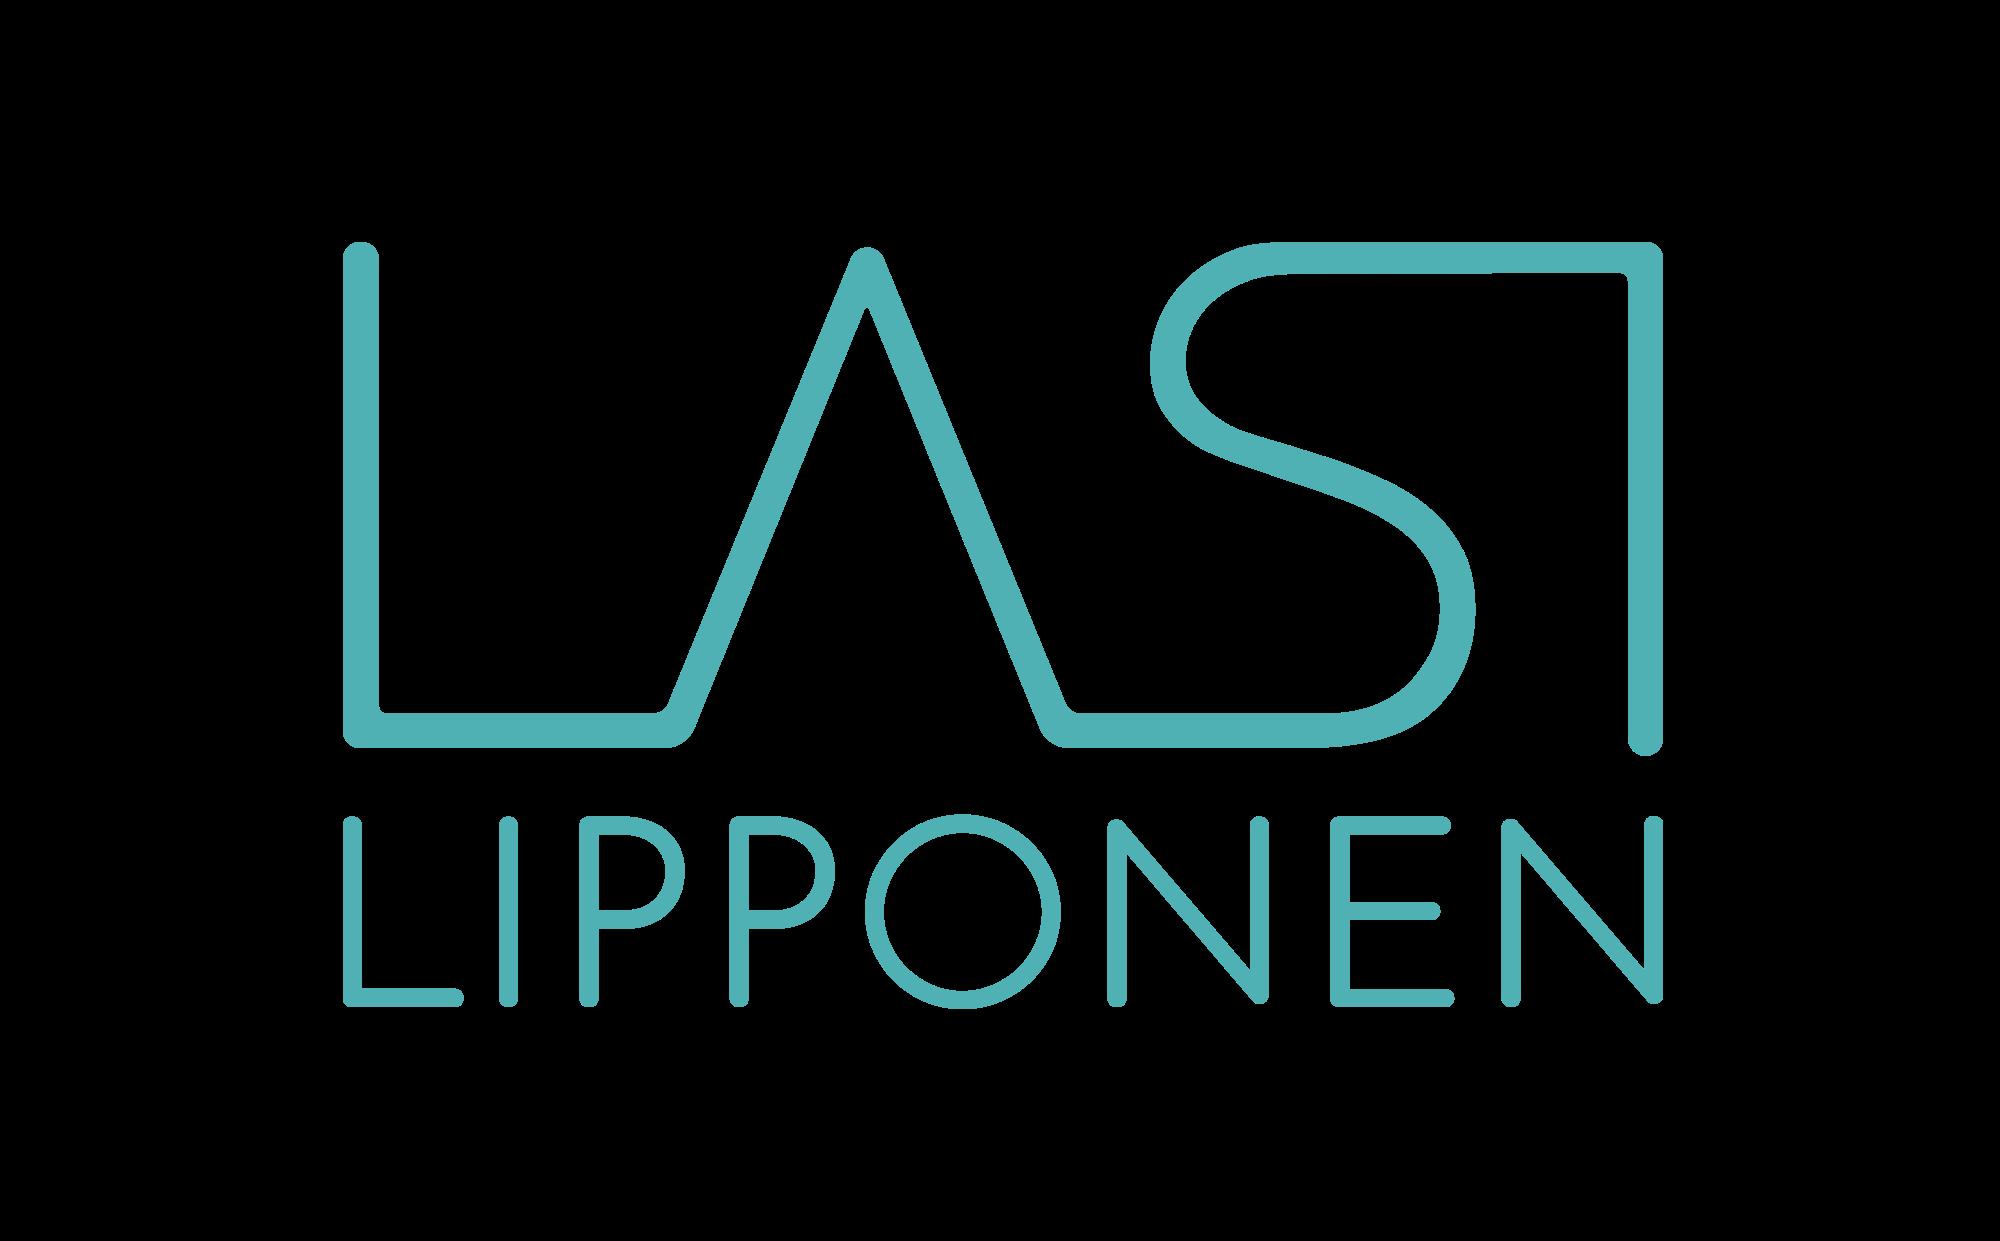 V.E.Lipponen Oy